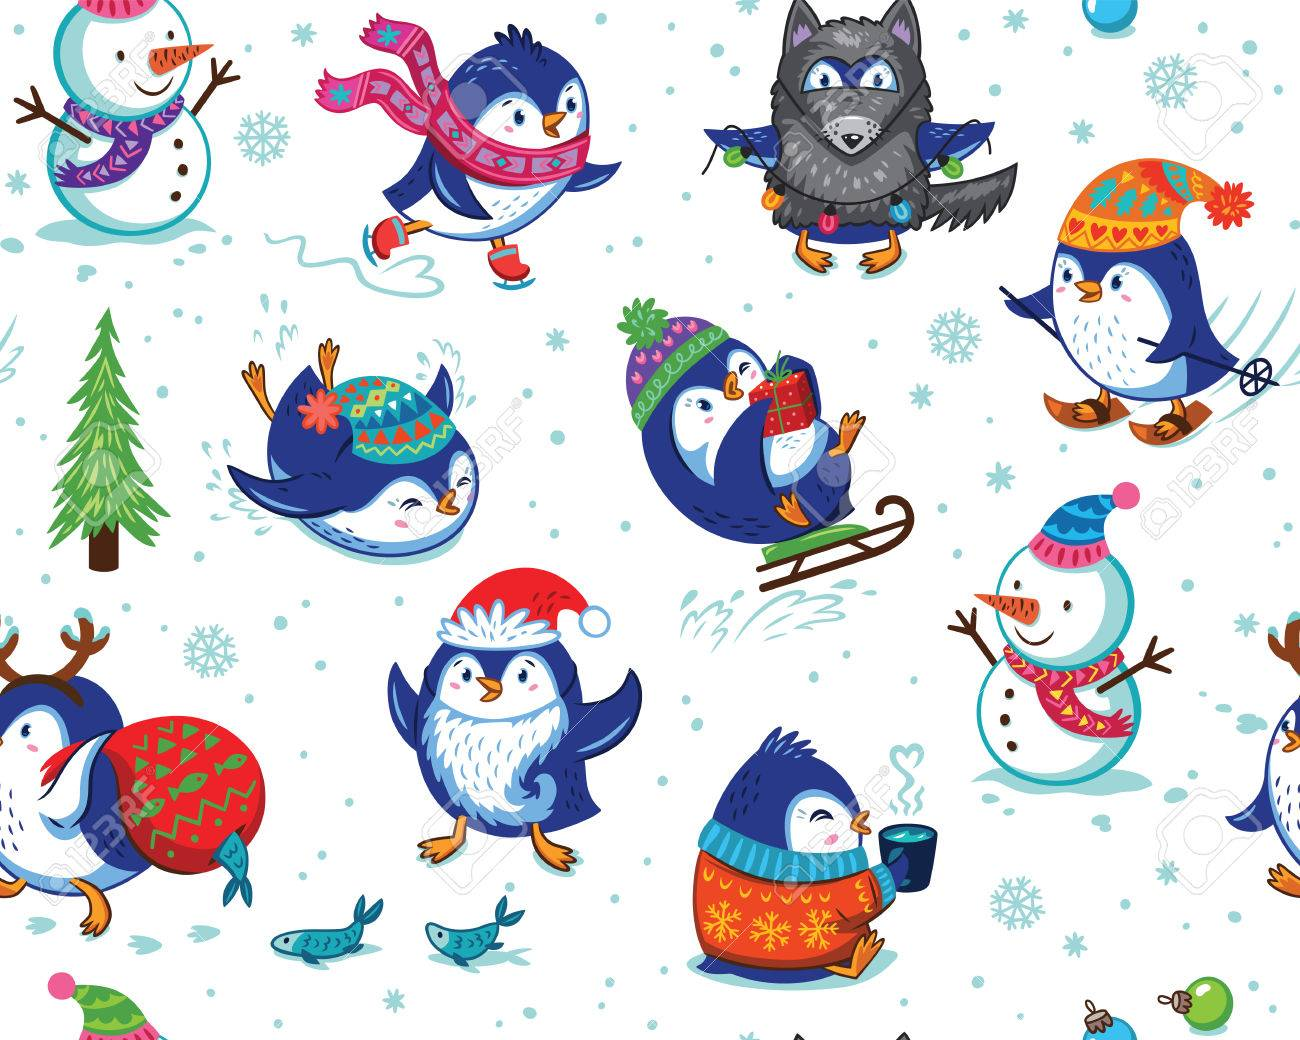 Dibujos para navidad pintados